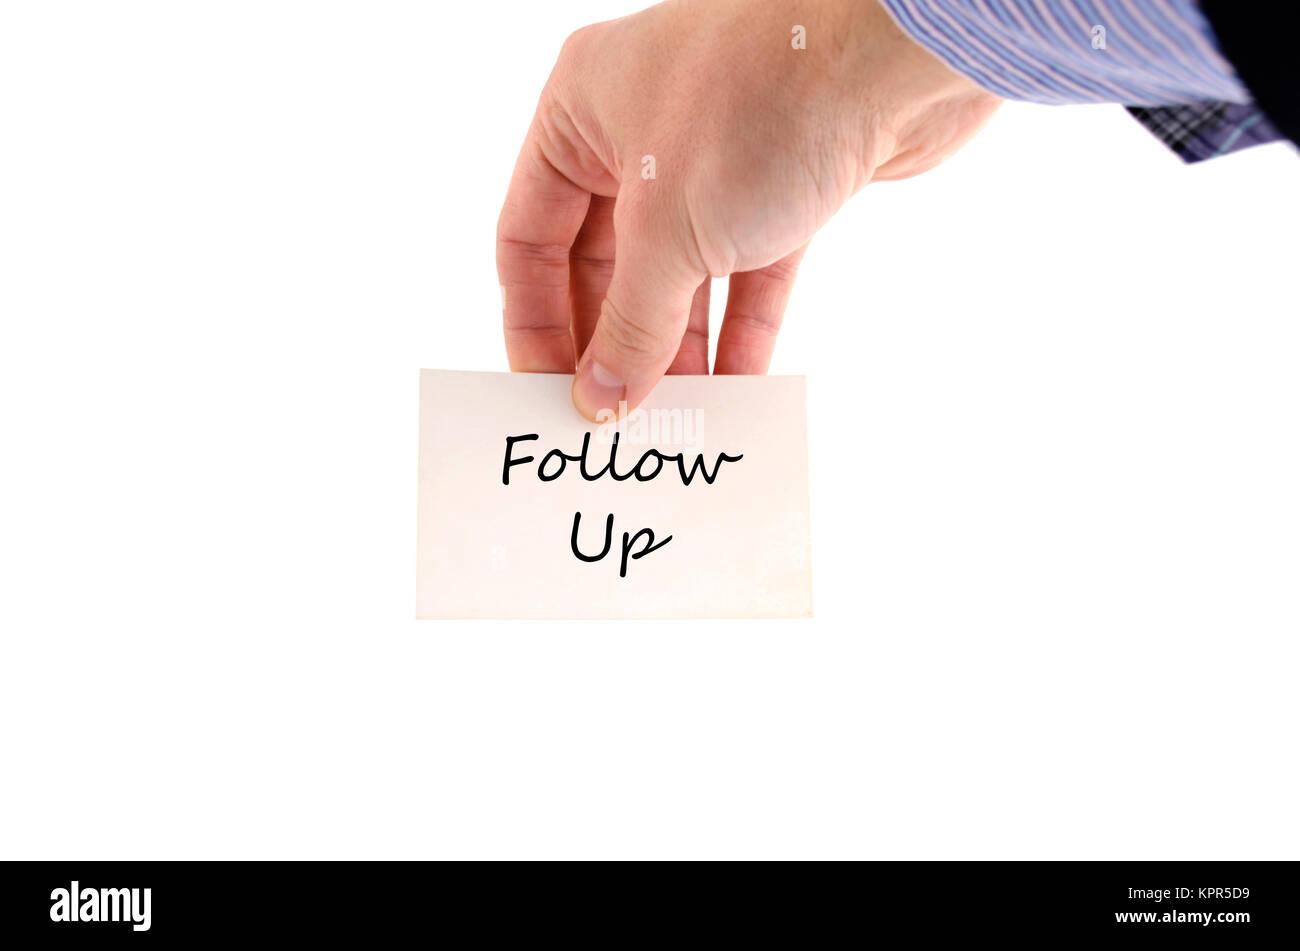 Follow up text concept - Stock Image